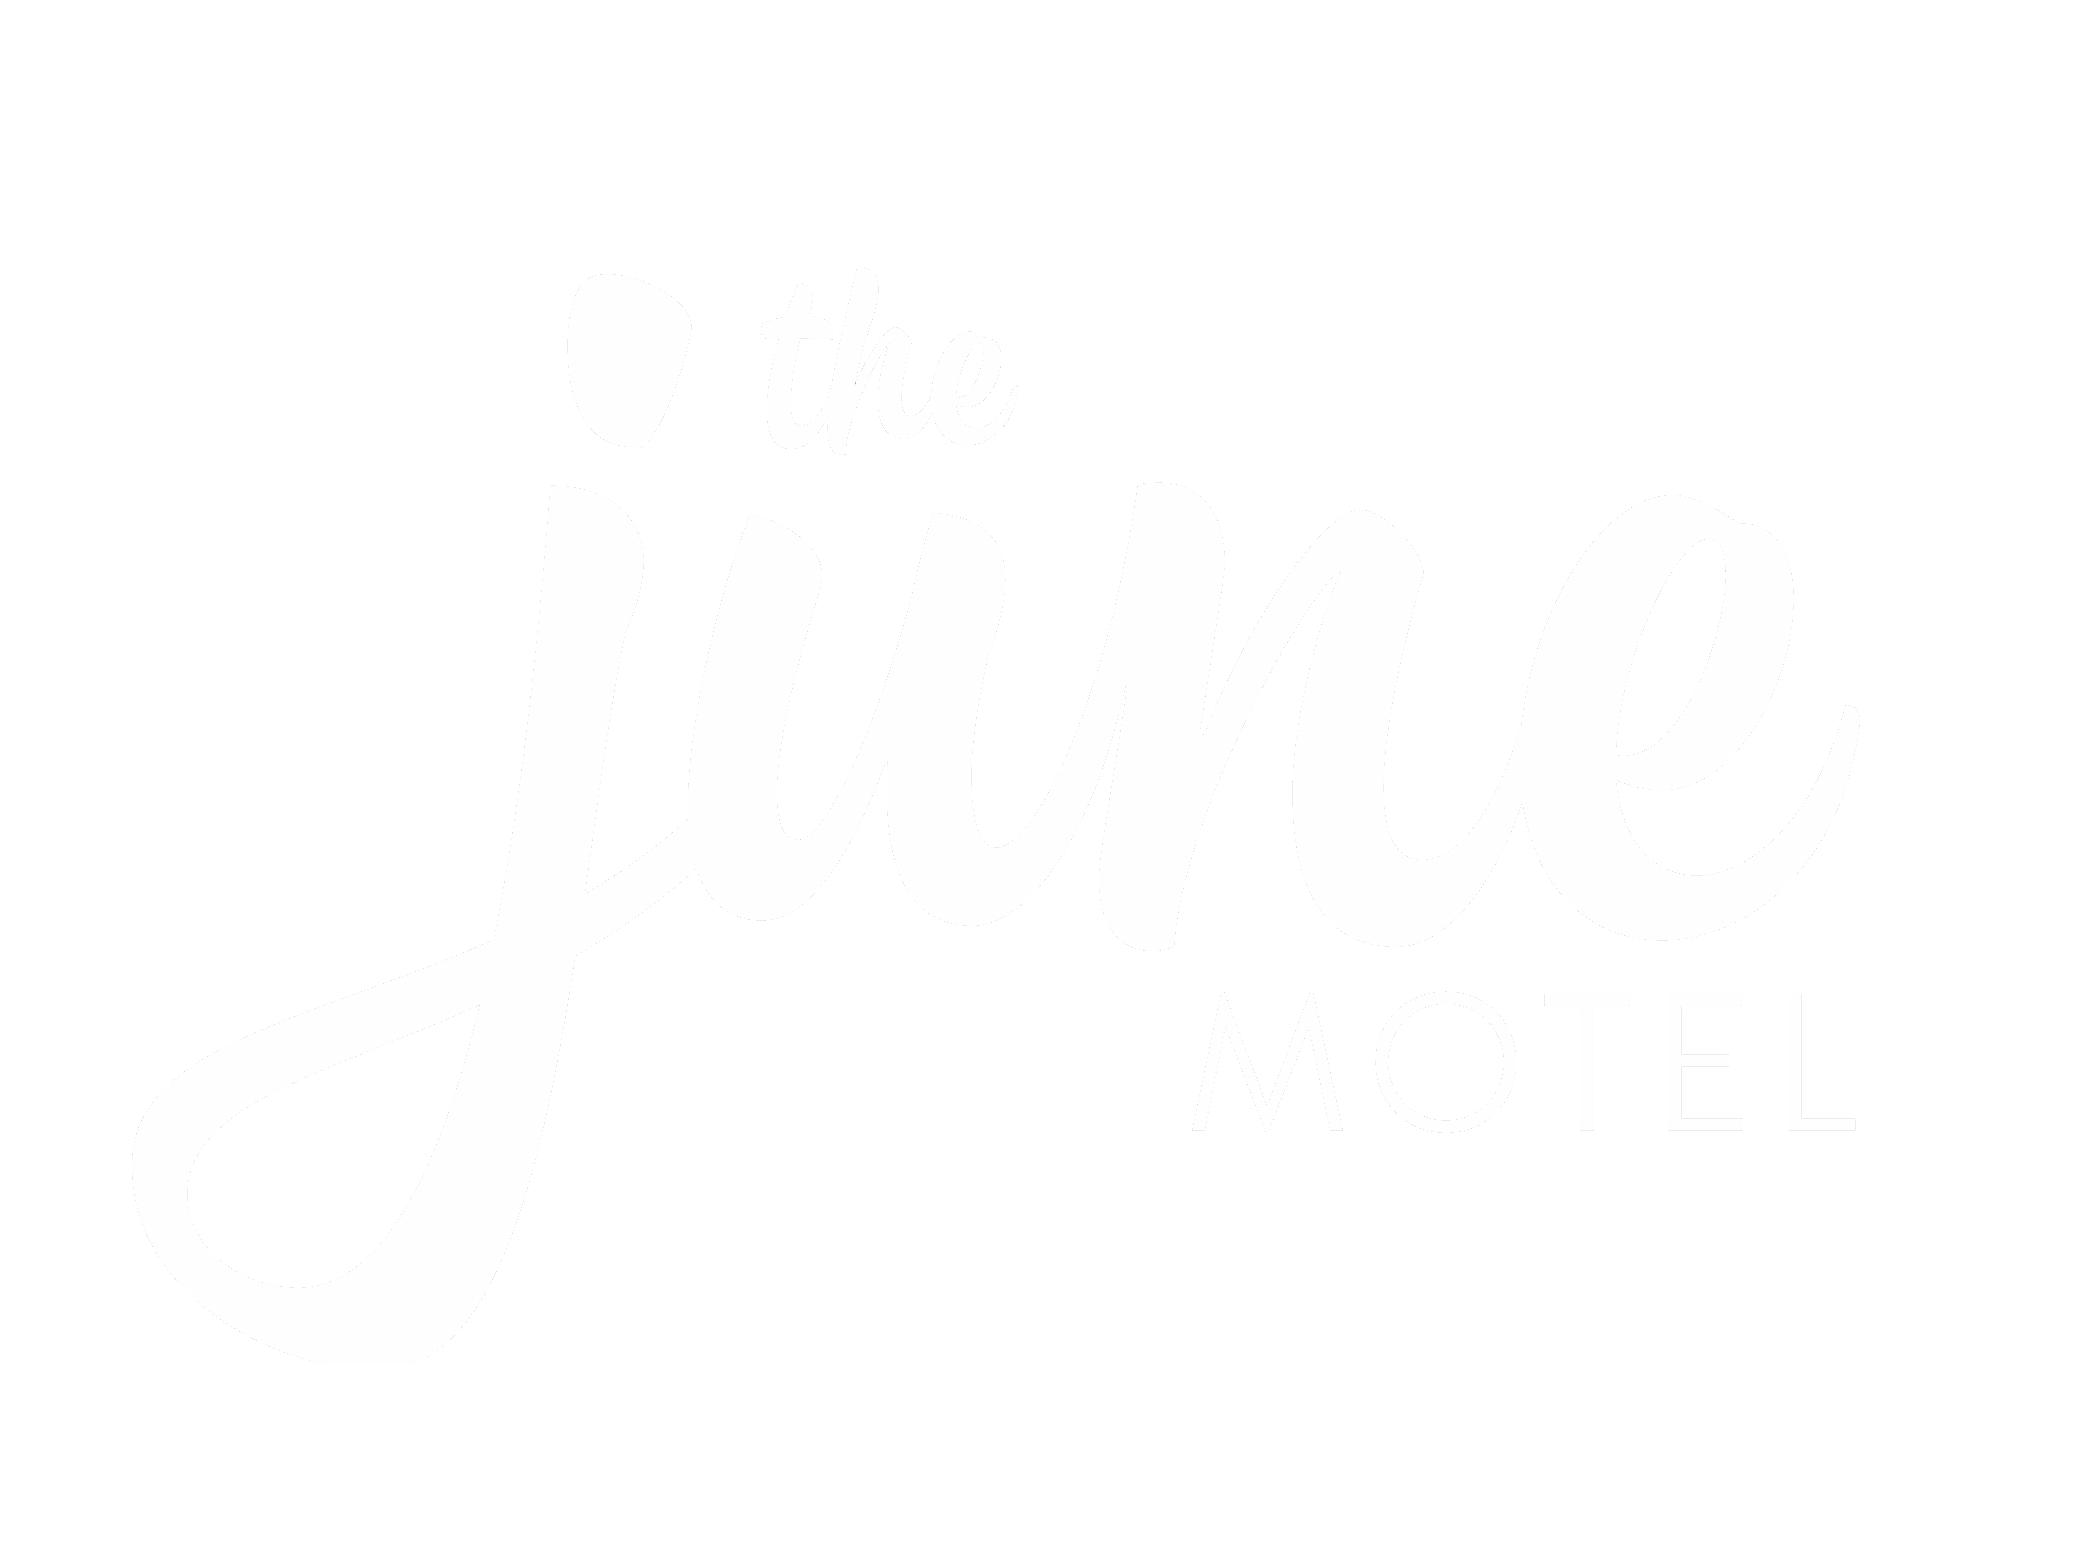 June_logo-transparent-invert.png